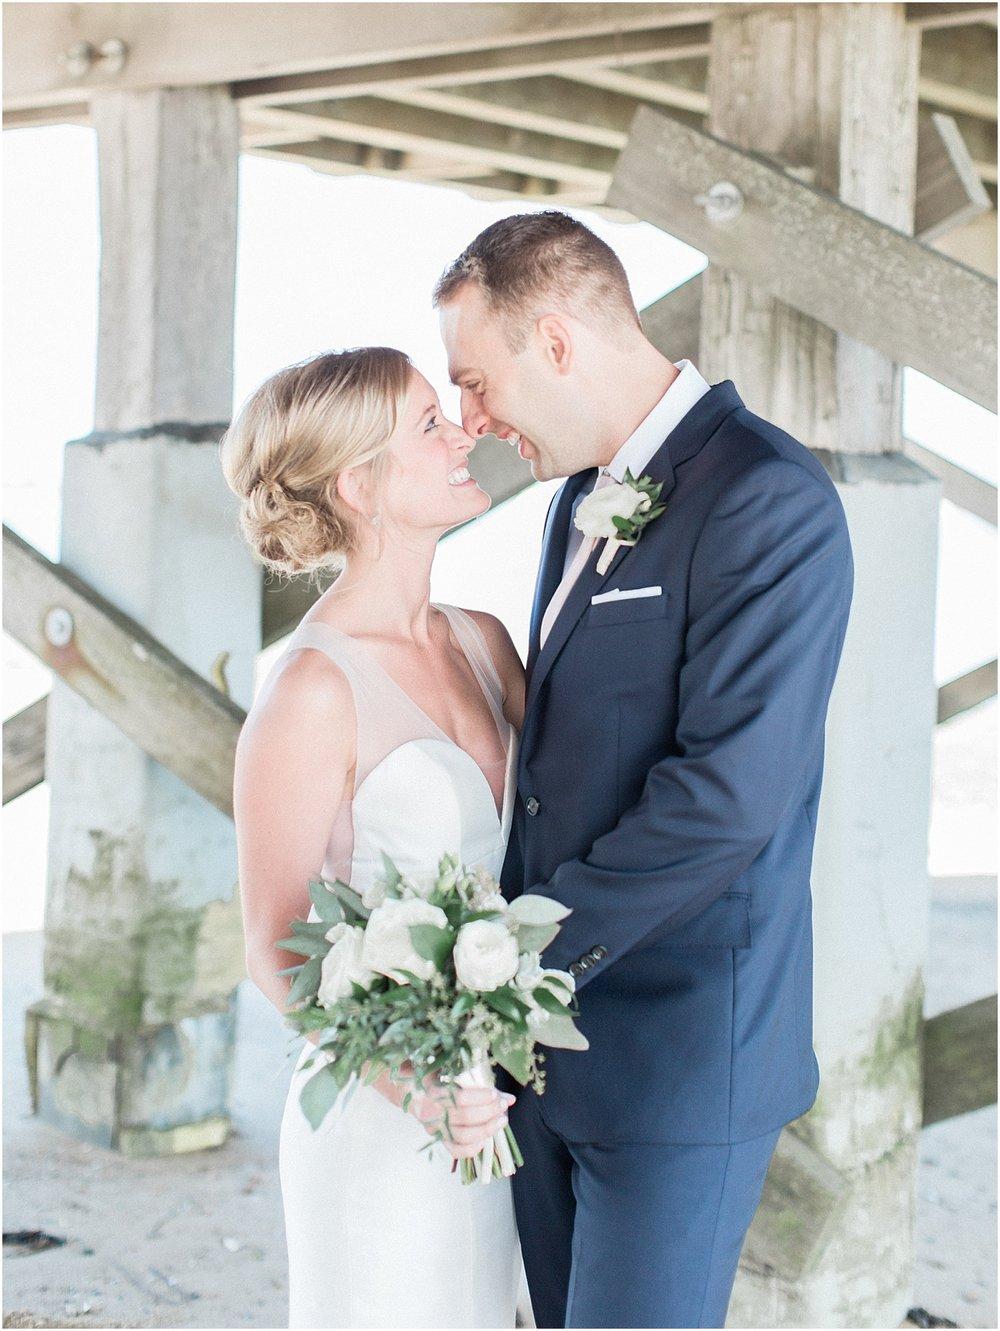 claire_gordon_duxbury_bay_maritime_school_beach_dock_powder_point_bridge_cape_cod_boston_wedding_photographer_meredith_jane_photography_photo_0583.jpg